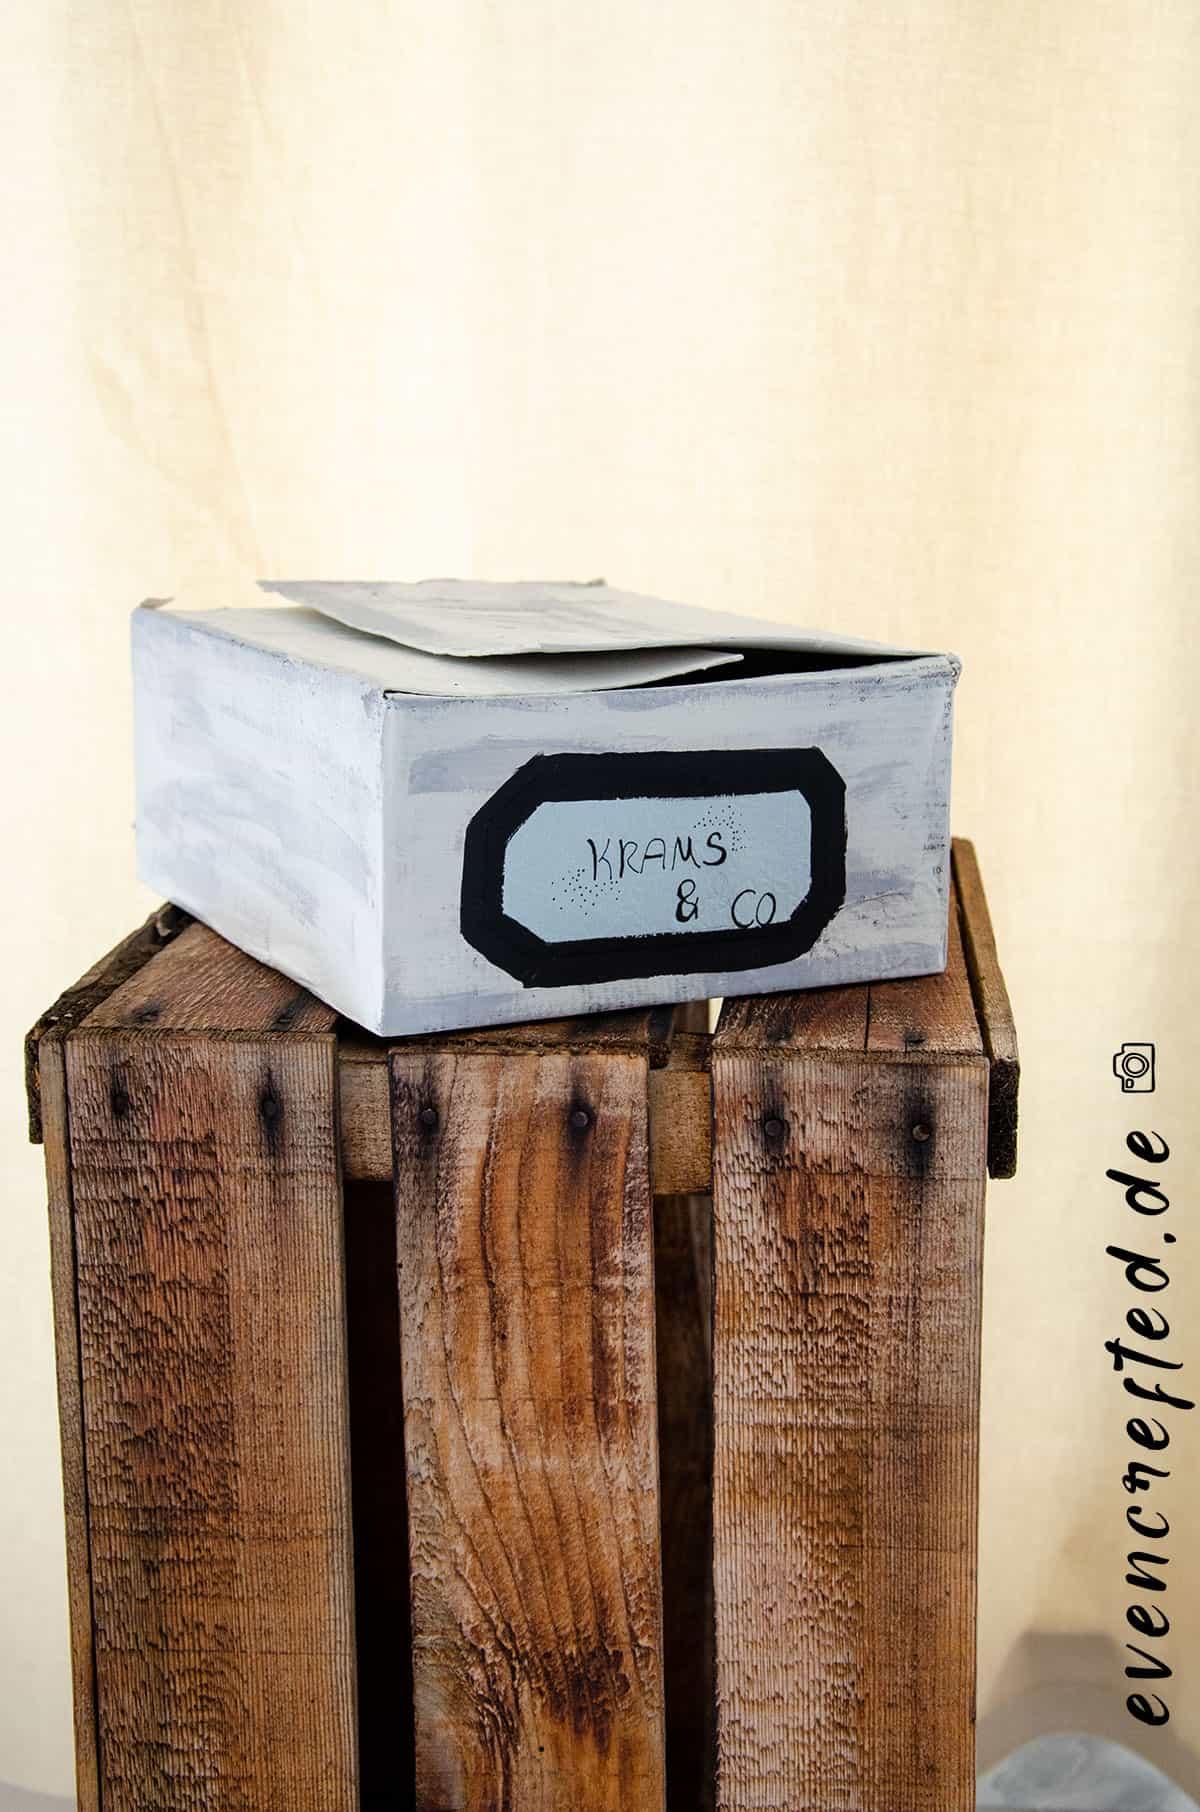 Karton bemalen & bekleben- kreative Upcycling Idee evencrafted.de ♥ DIY & Naturkosmetik Blog